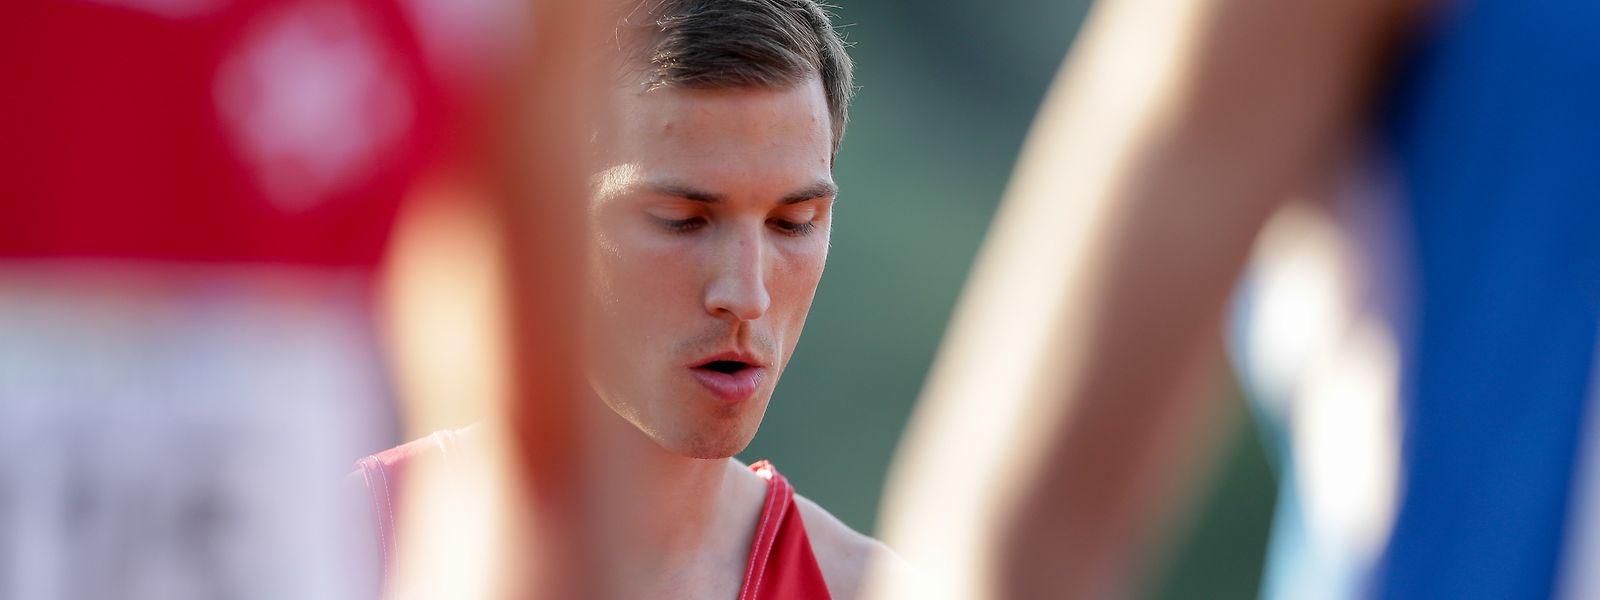 Charles Grethen fiel dem langsamen Rennen zum Opfer.